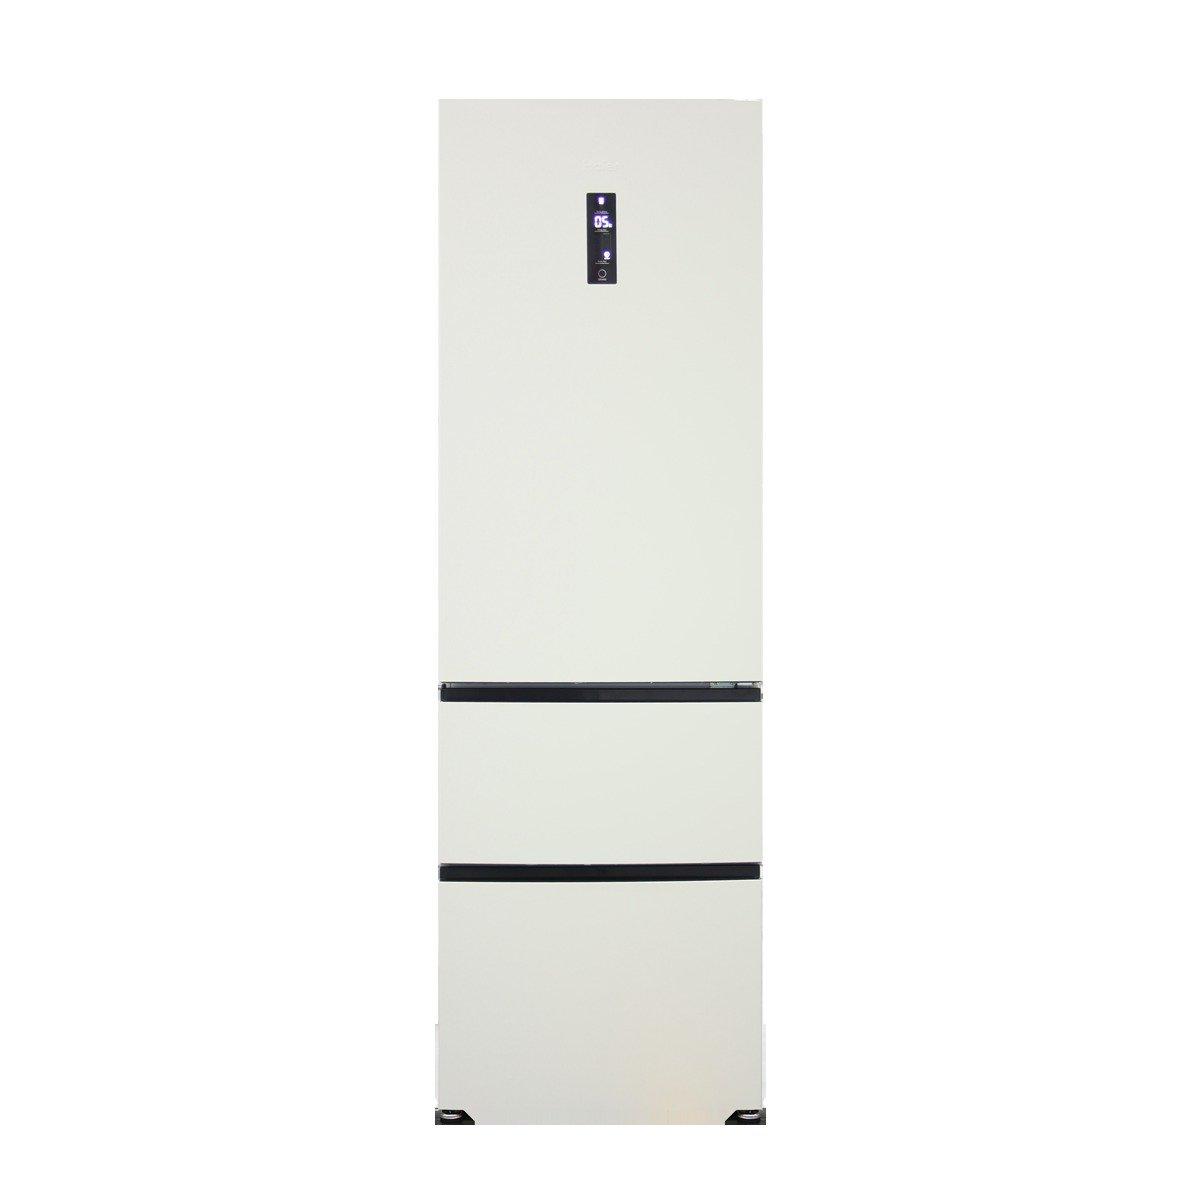 Image of Haier A2FE635CCJ American Fridge Freezer - Cream - Installation